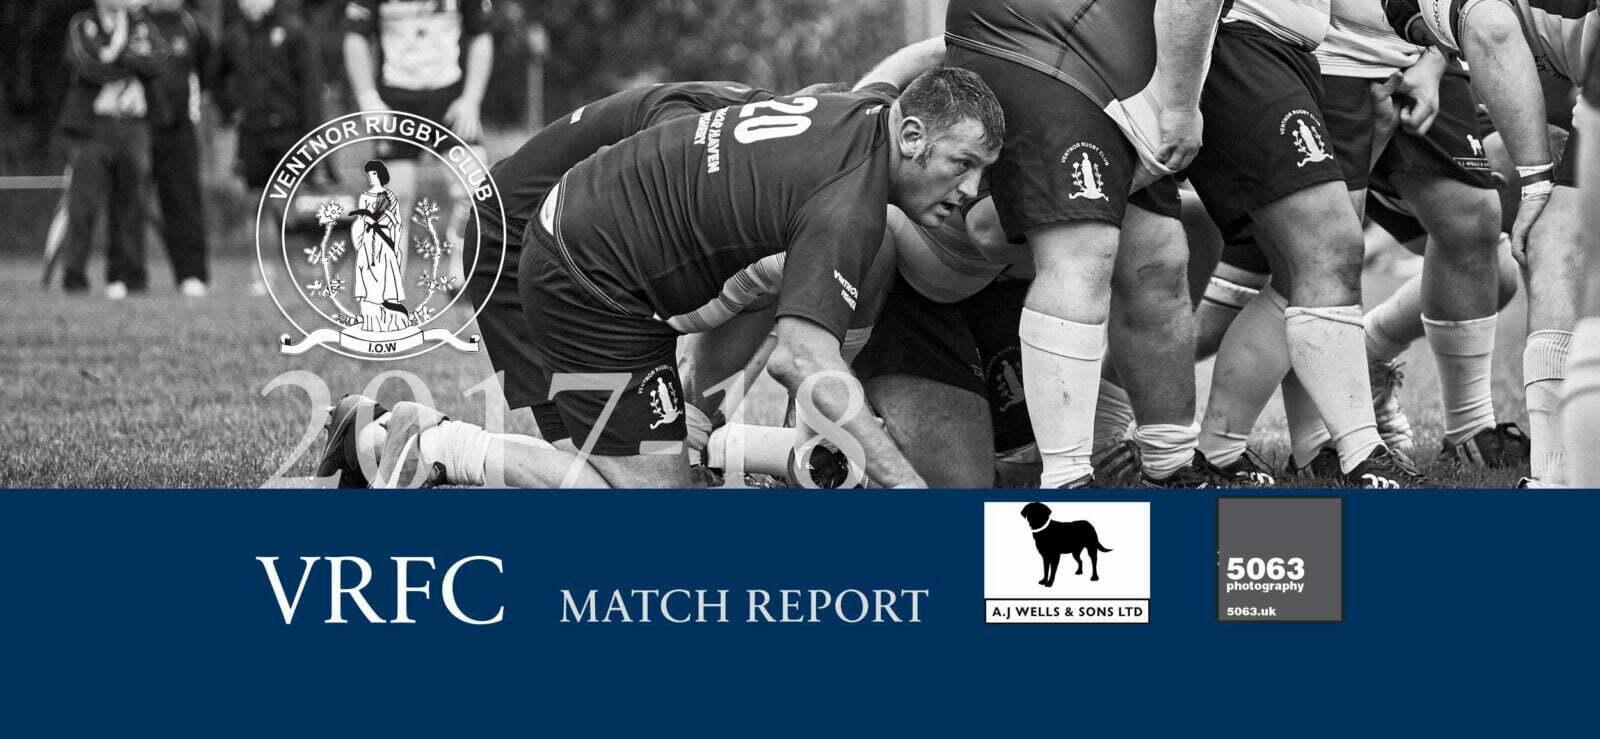 Match-report-Fordingbridge1st-XV-RFC-v-Ventnor-RFC-1st-XV-30092017-slider-d